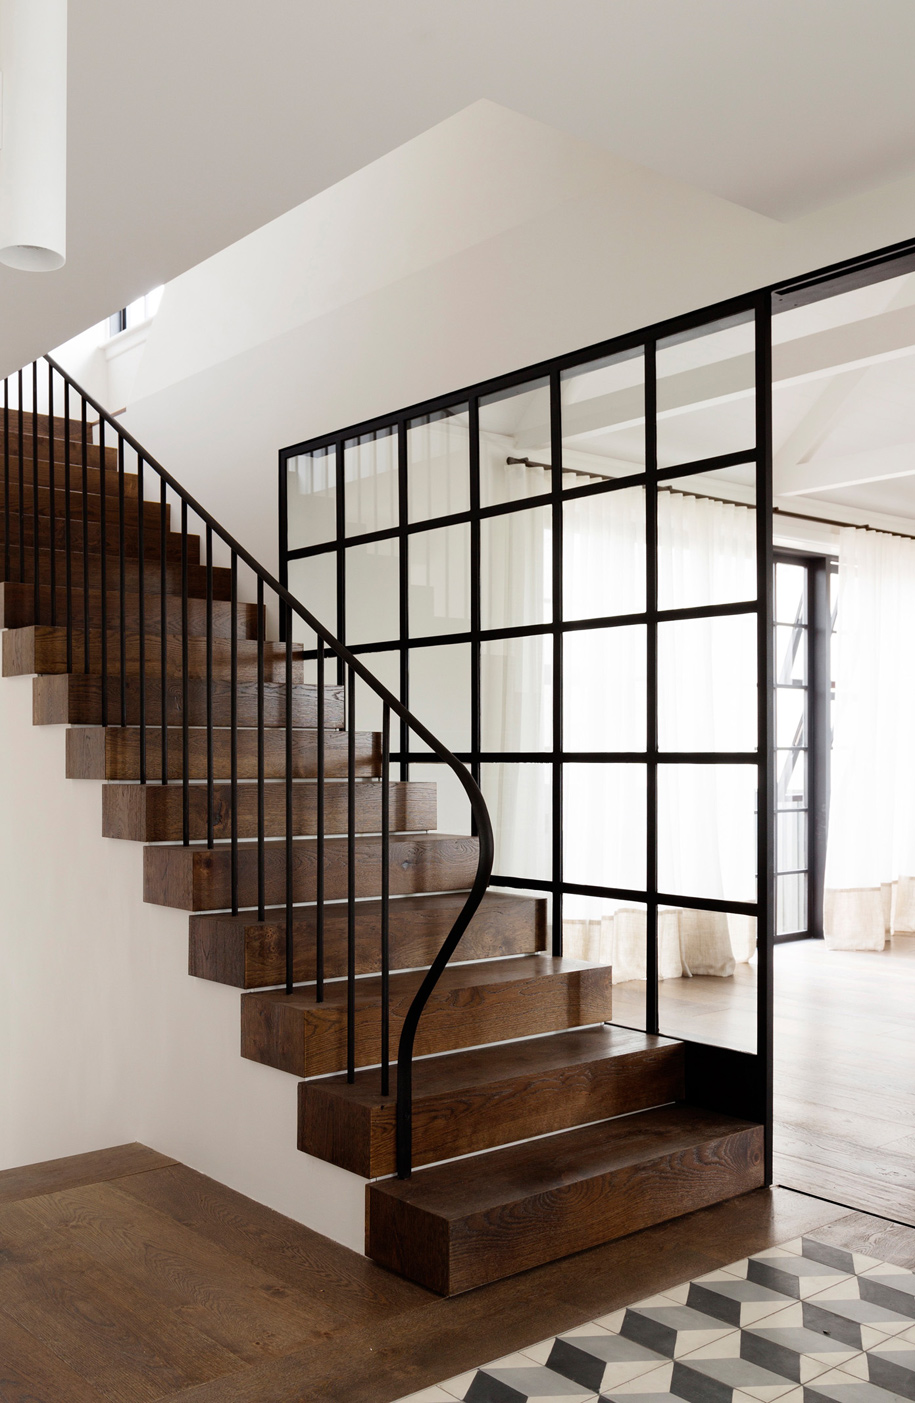 Luigi-Rosselli-Architects--Balancing-Home----011